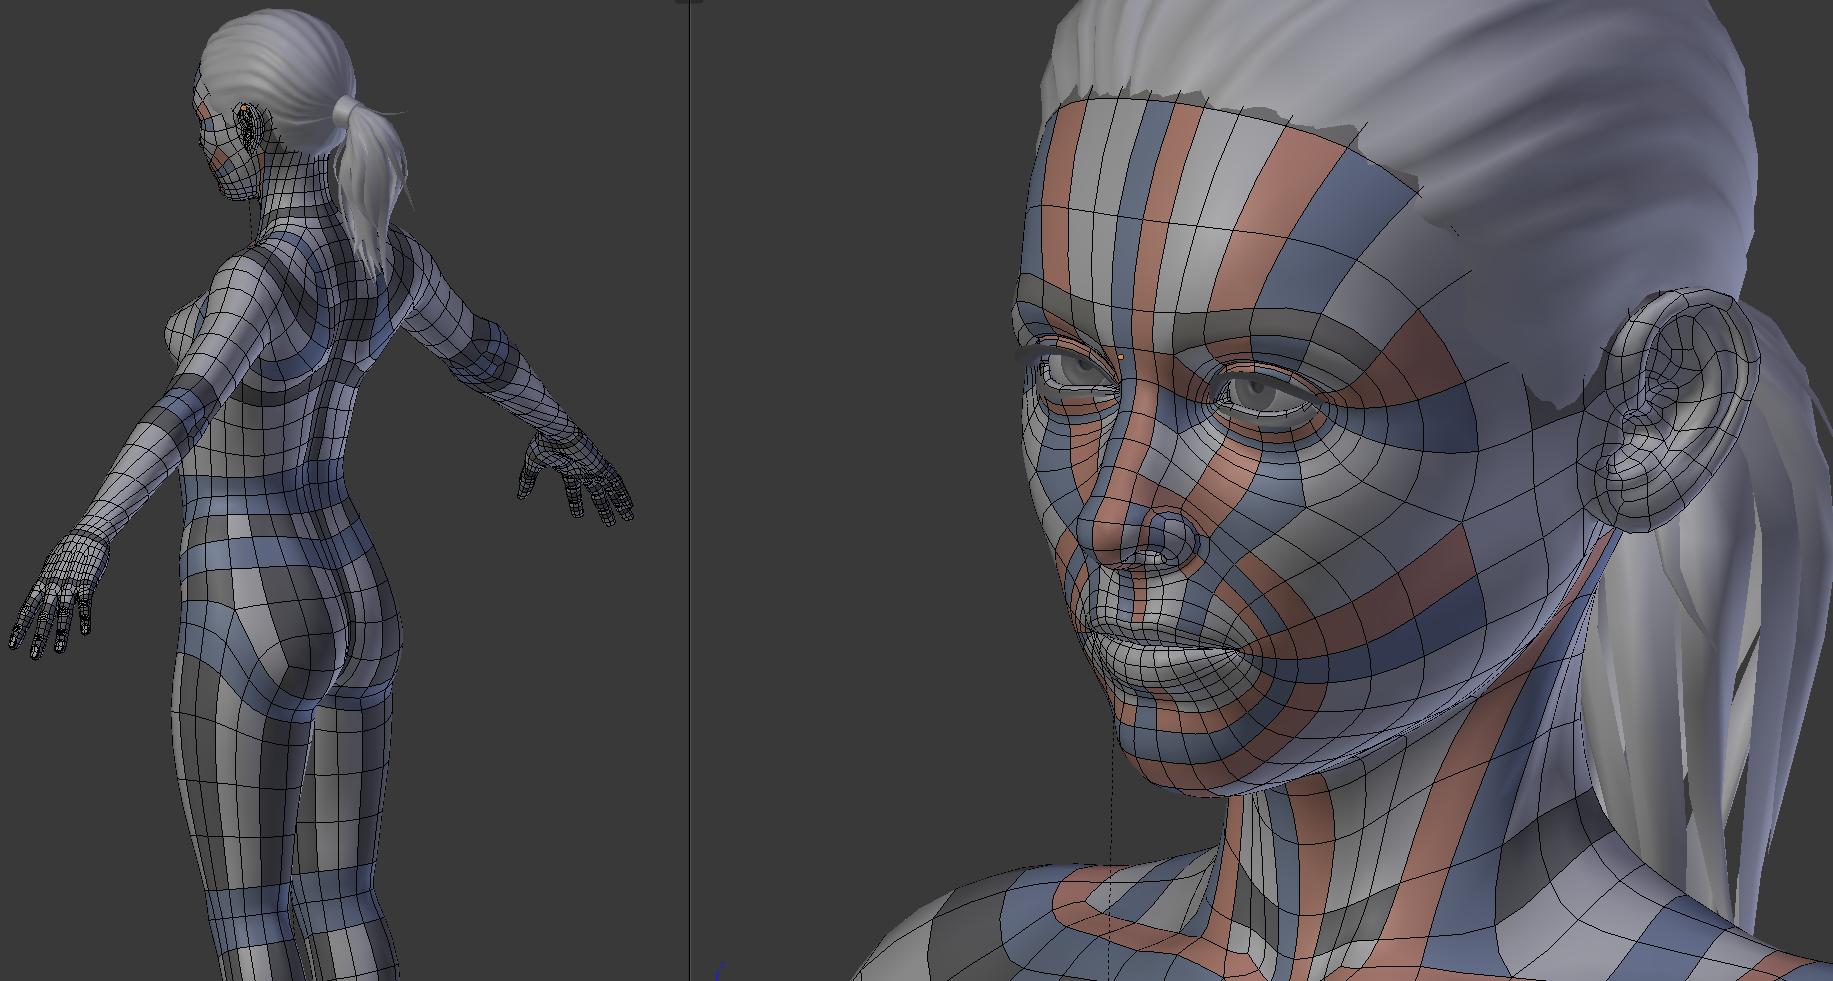 Blender Character Modeling 10 Of 10 : Call for review blender demoloop tears of steel